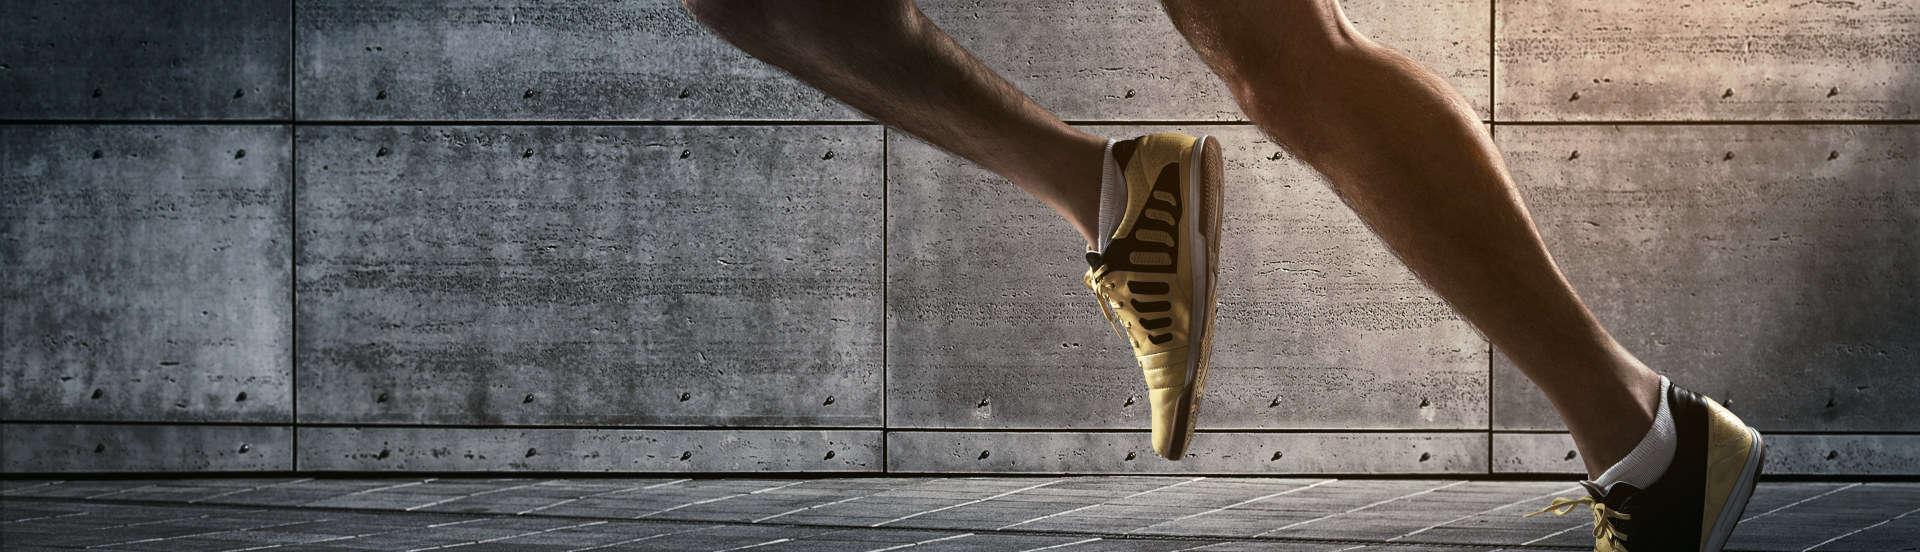 joggers legs running